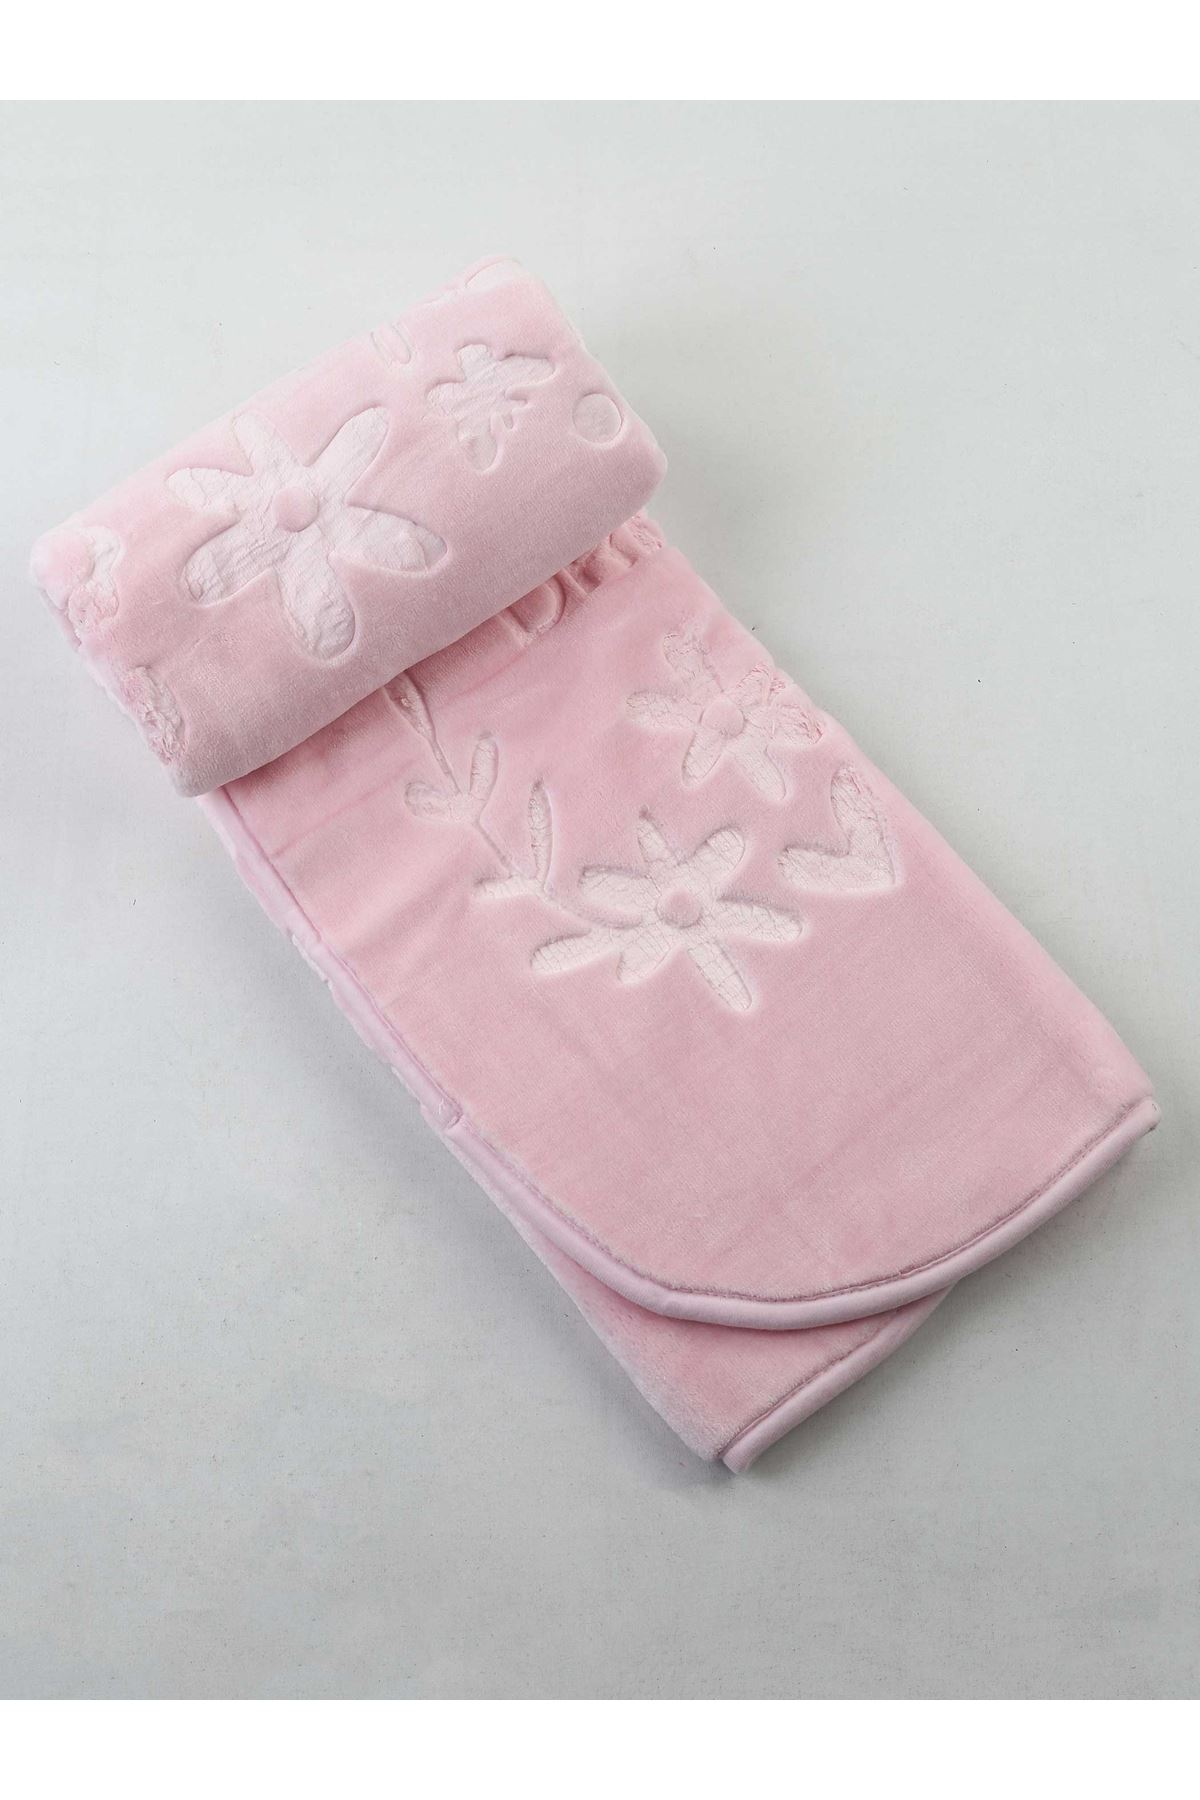 Pembe Peluş 120x100 cm Kız Bebek Battaniye